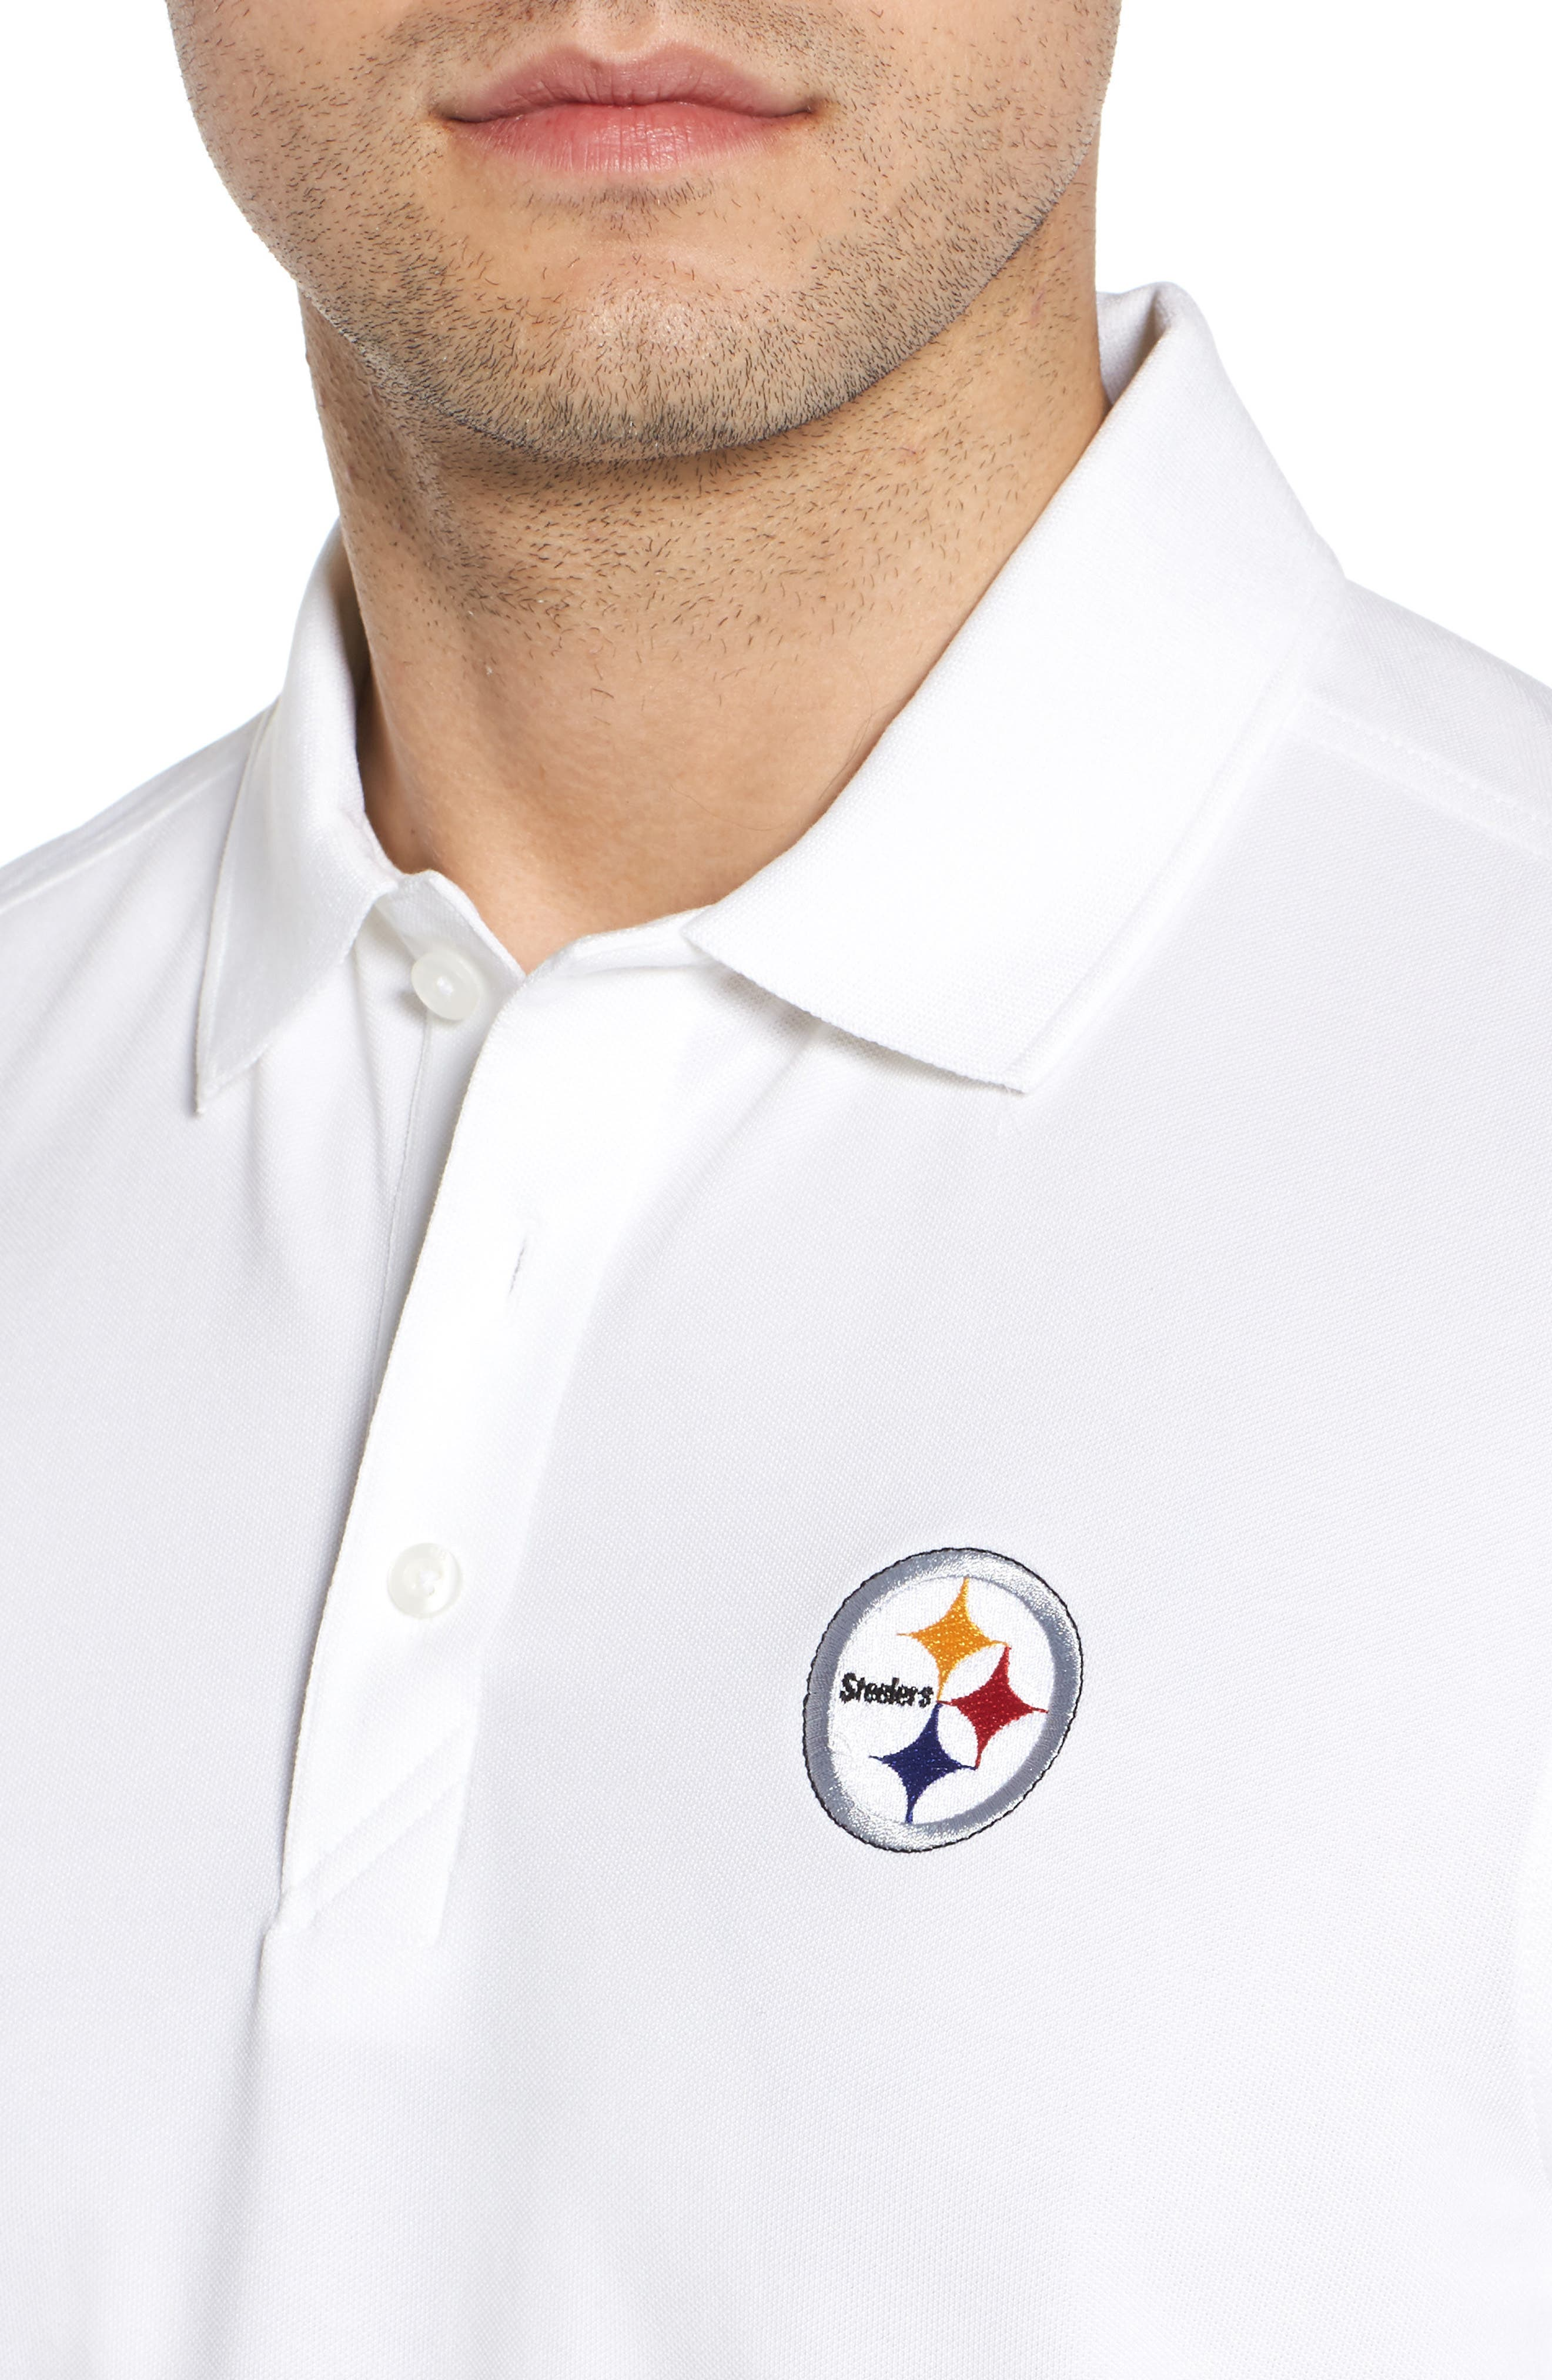 Pittsburgh Steelers - Advantage Regular Fit DryTec Polo,                             Alternate thumbnail 6, color,                             White